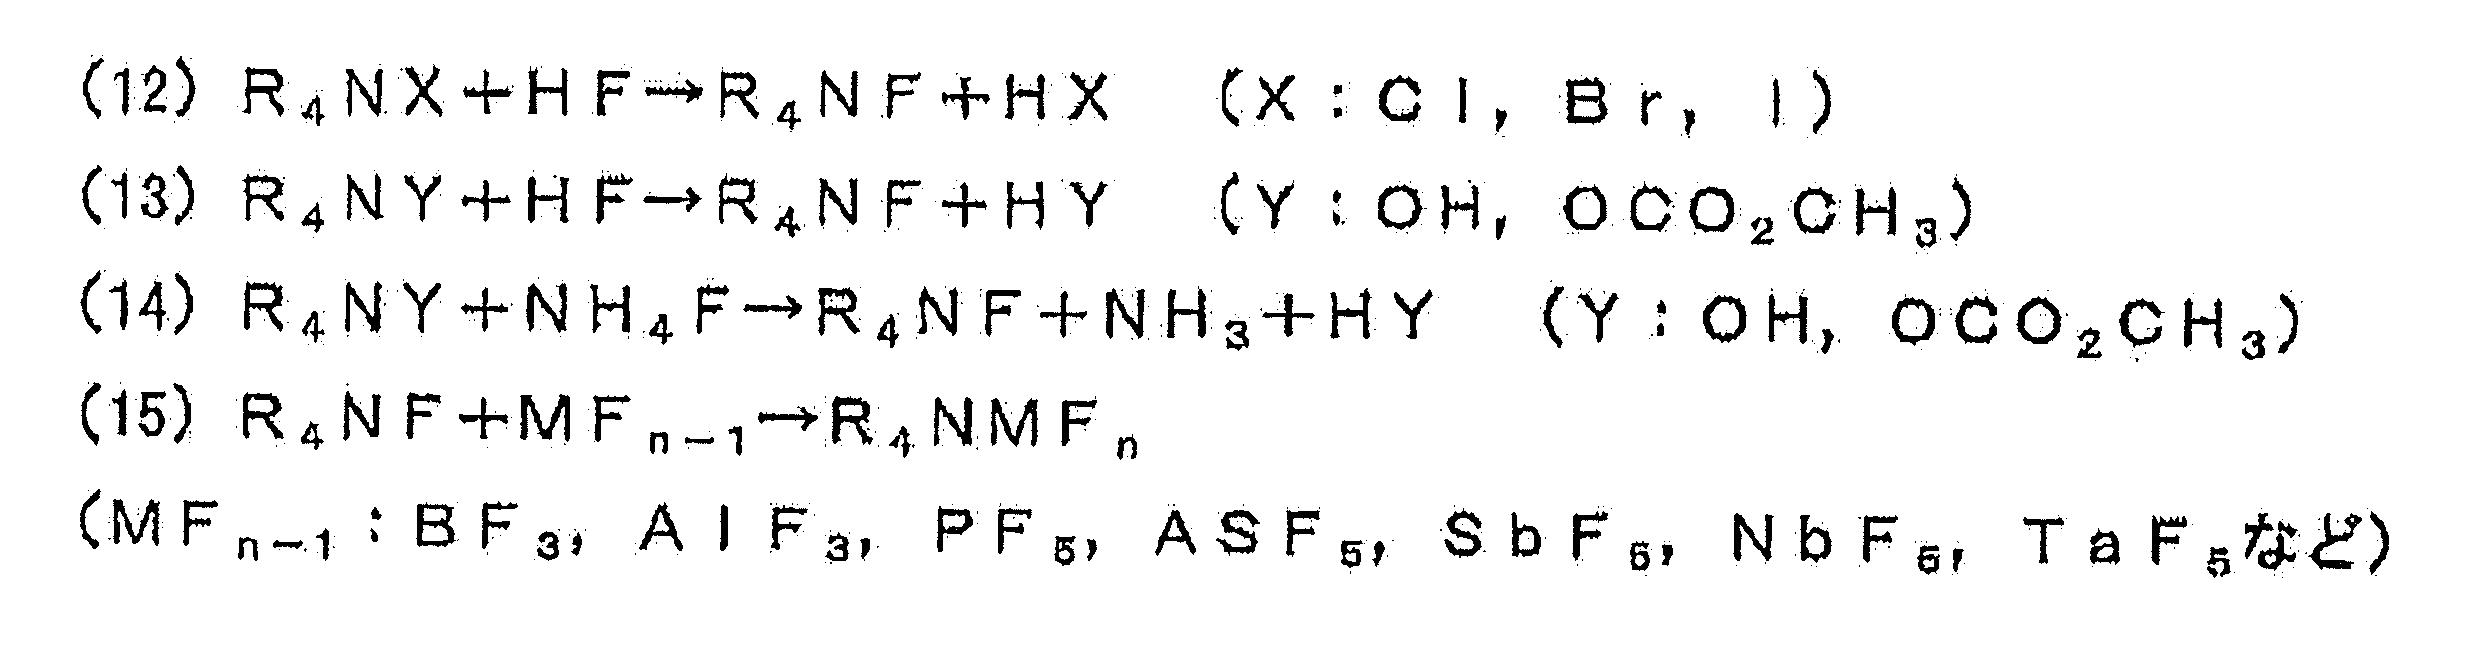 WO2013058184A1 - 水分散型アクリル系粘着剤組成物、粘着剤層、及び粘着シート         - Google PatentsFamily